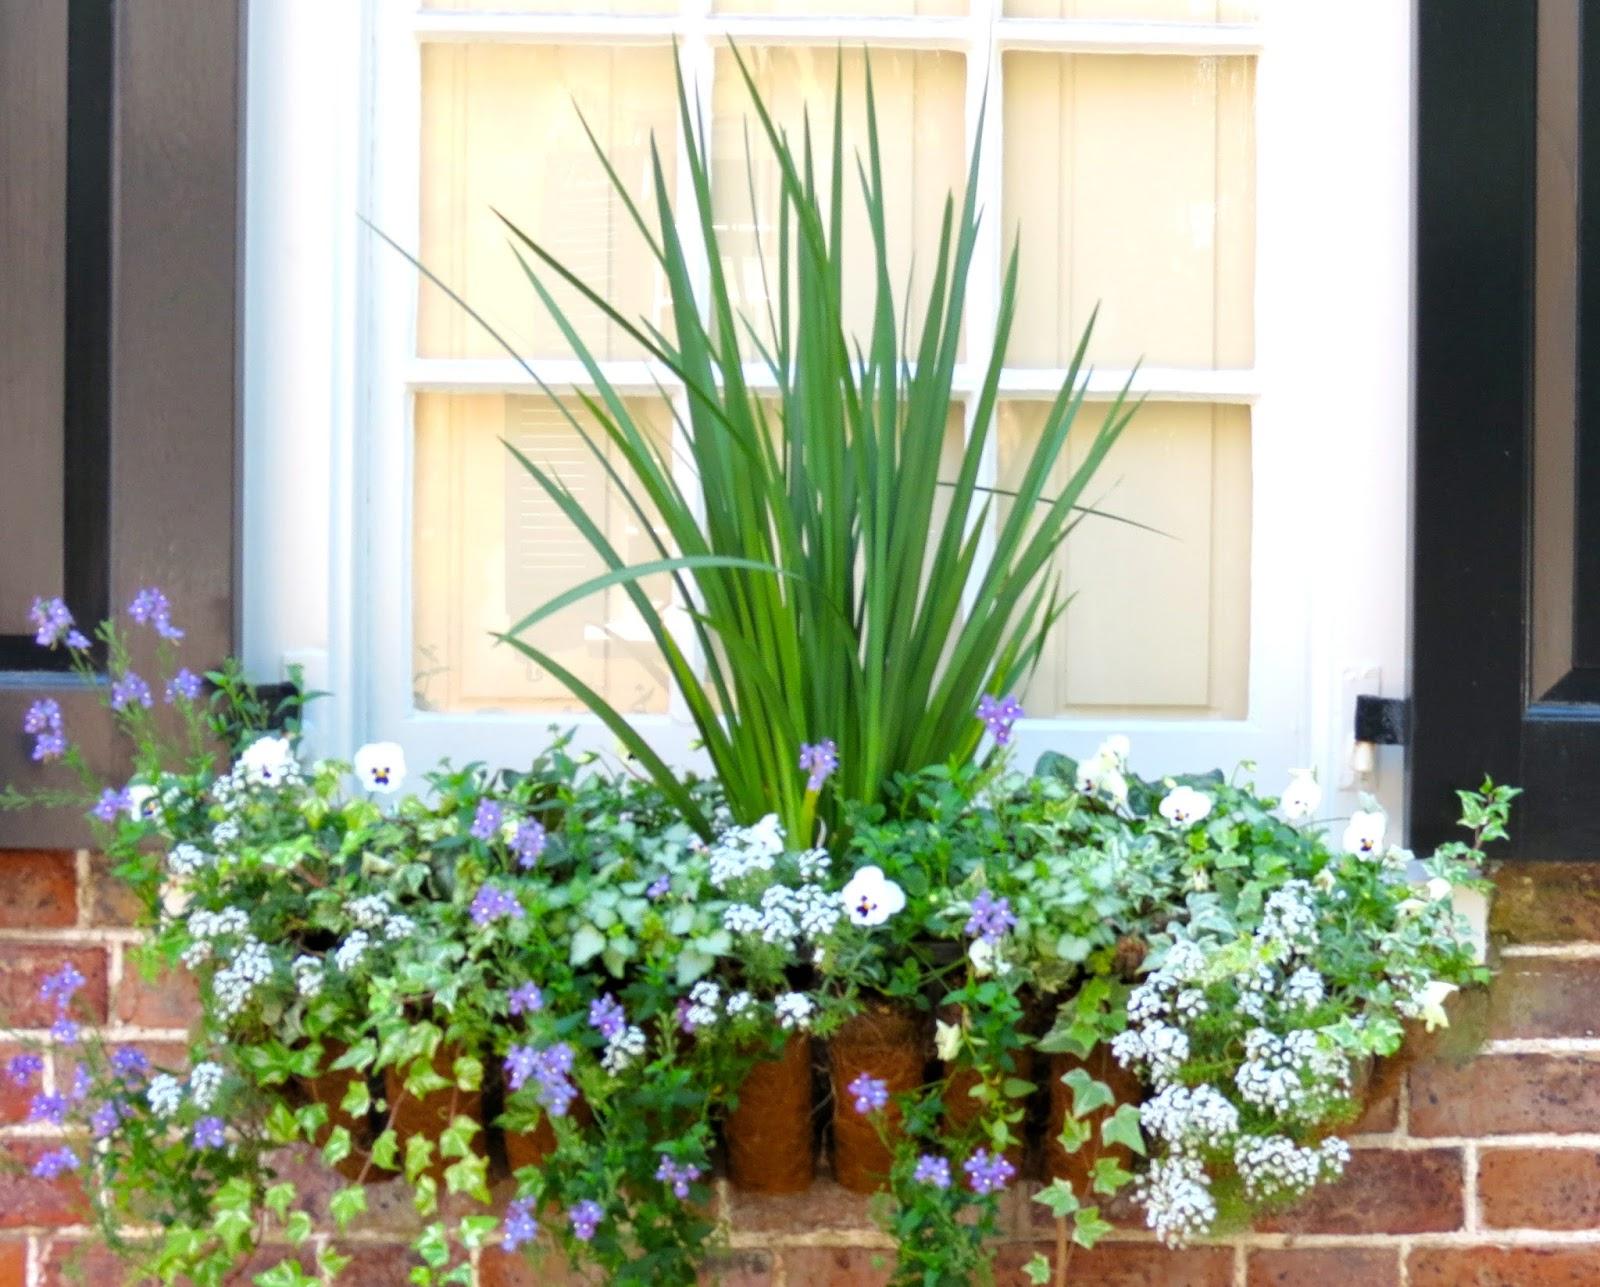 JLL DESIGN Window Box Ideas & More Garden Inspirations